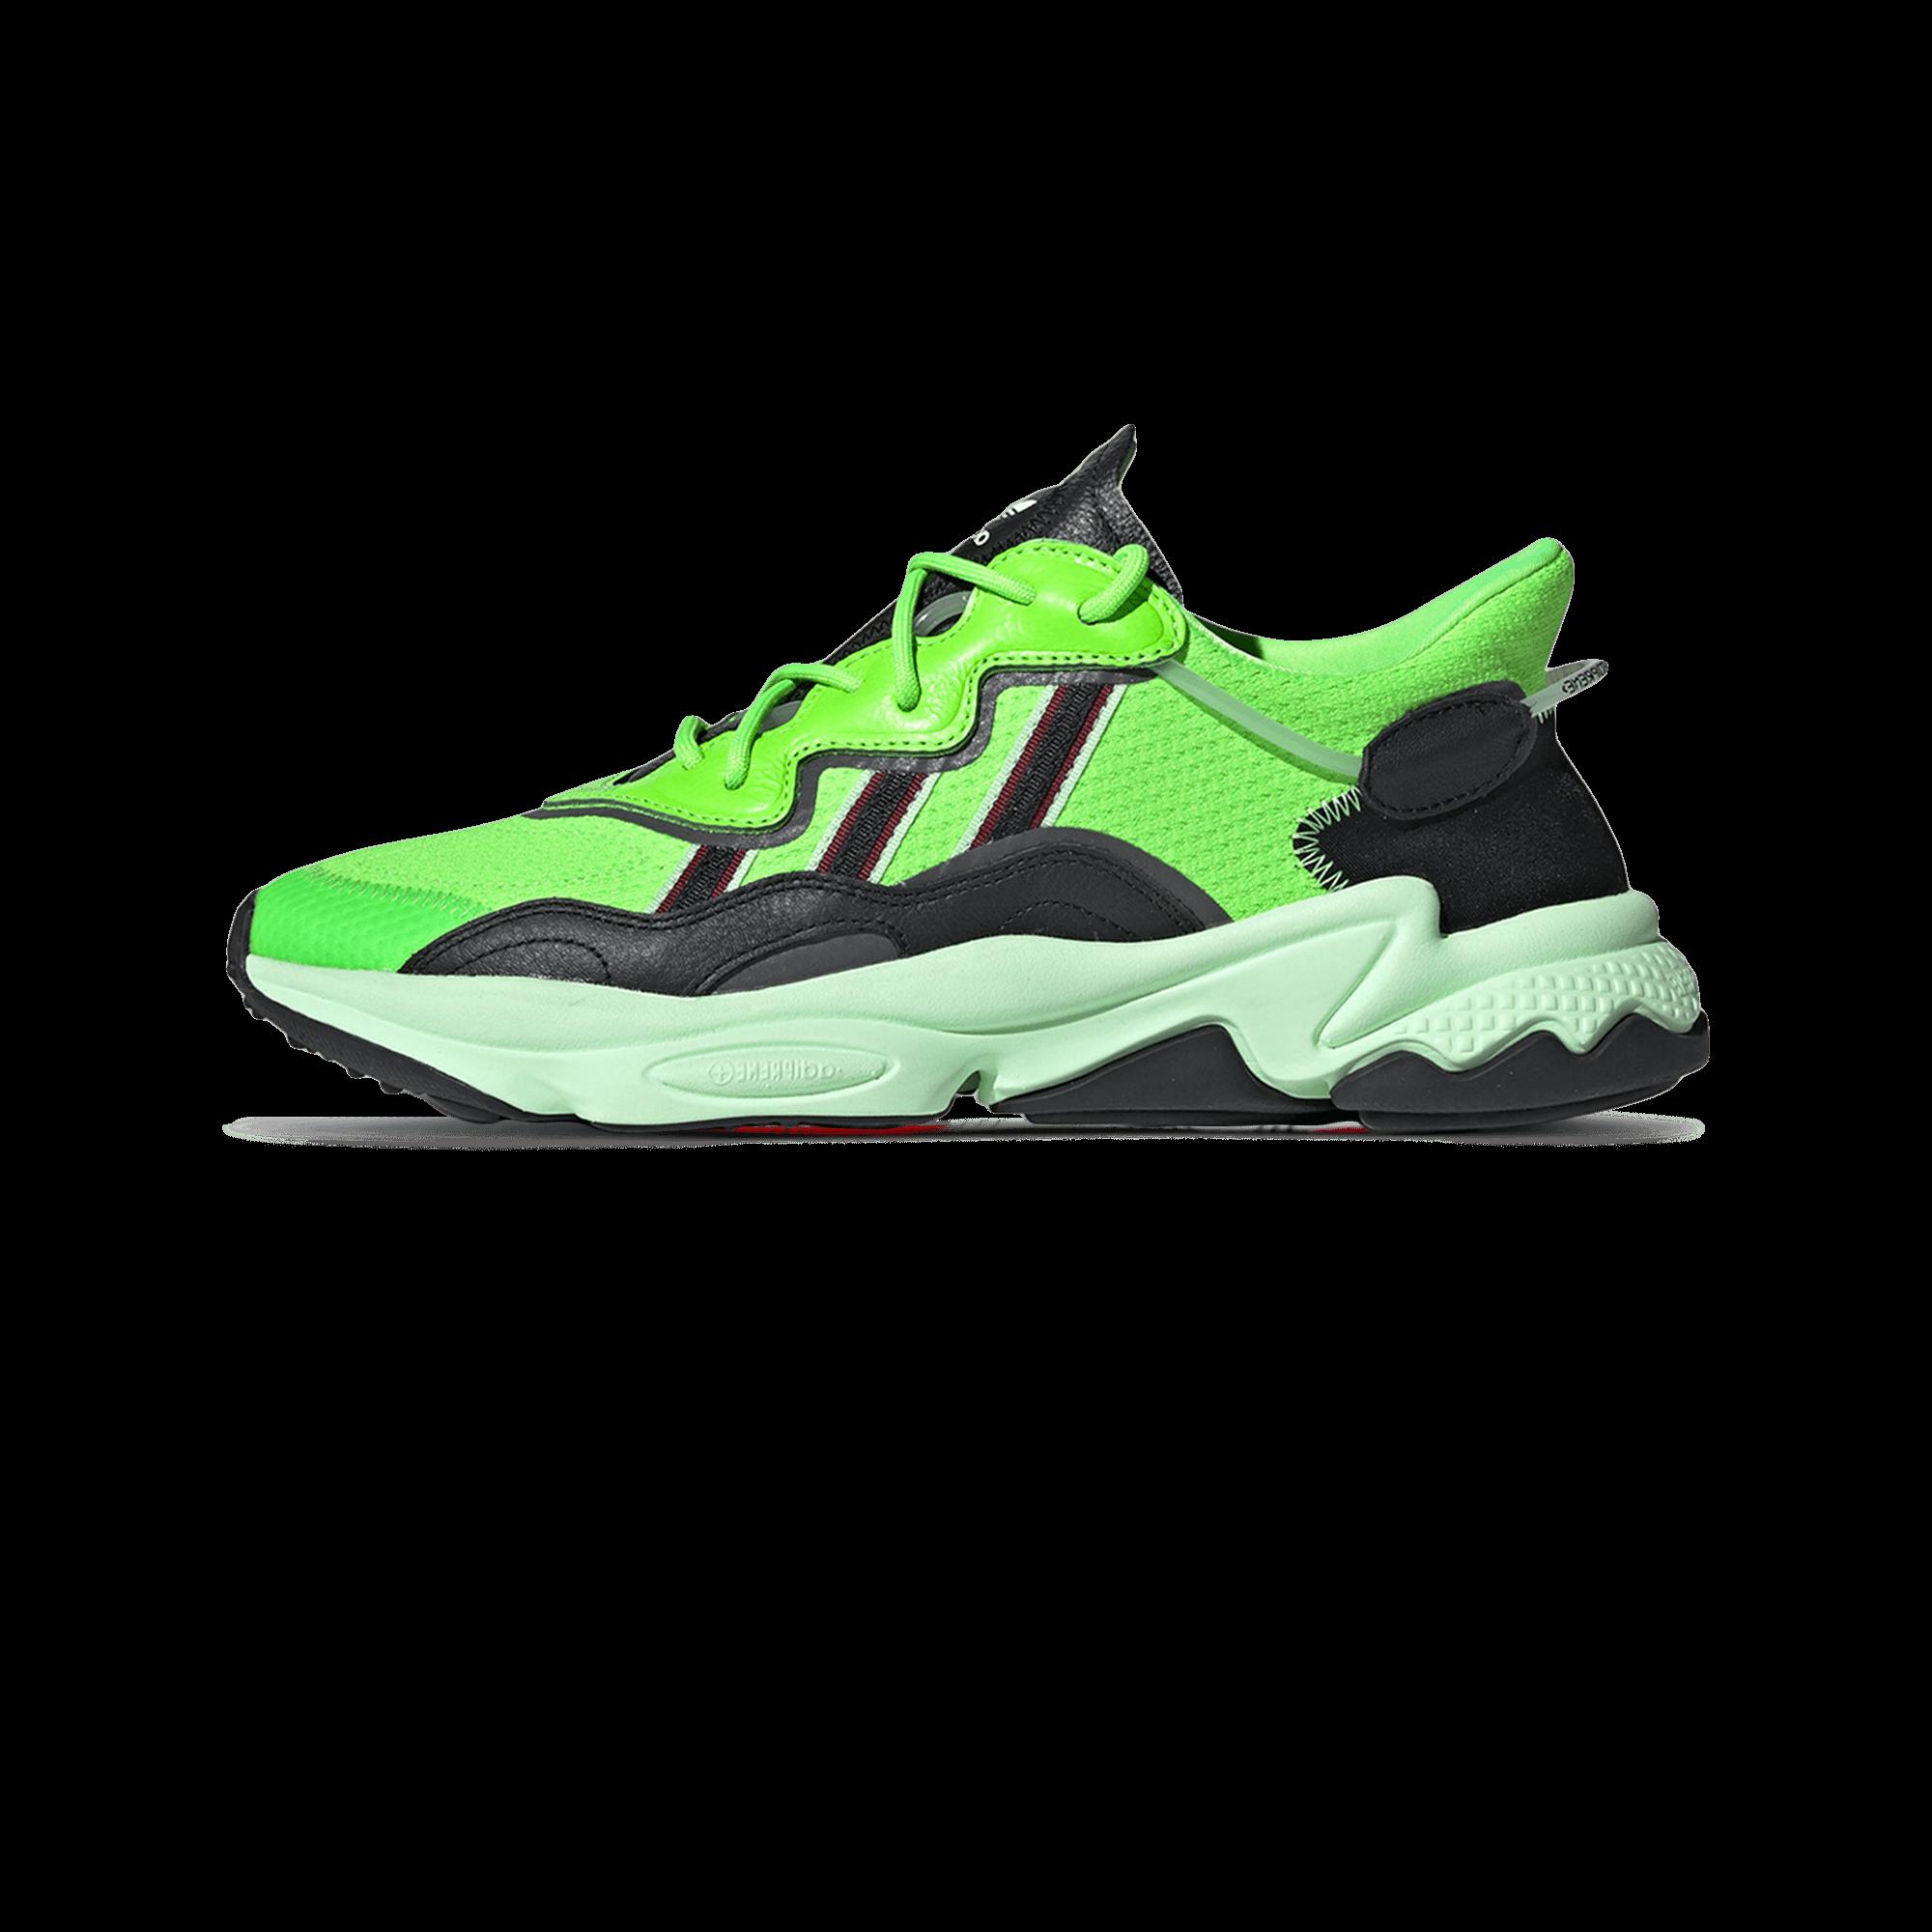 Ozweego green / black